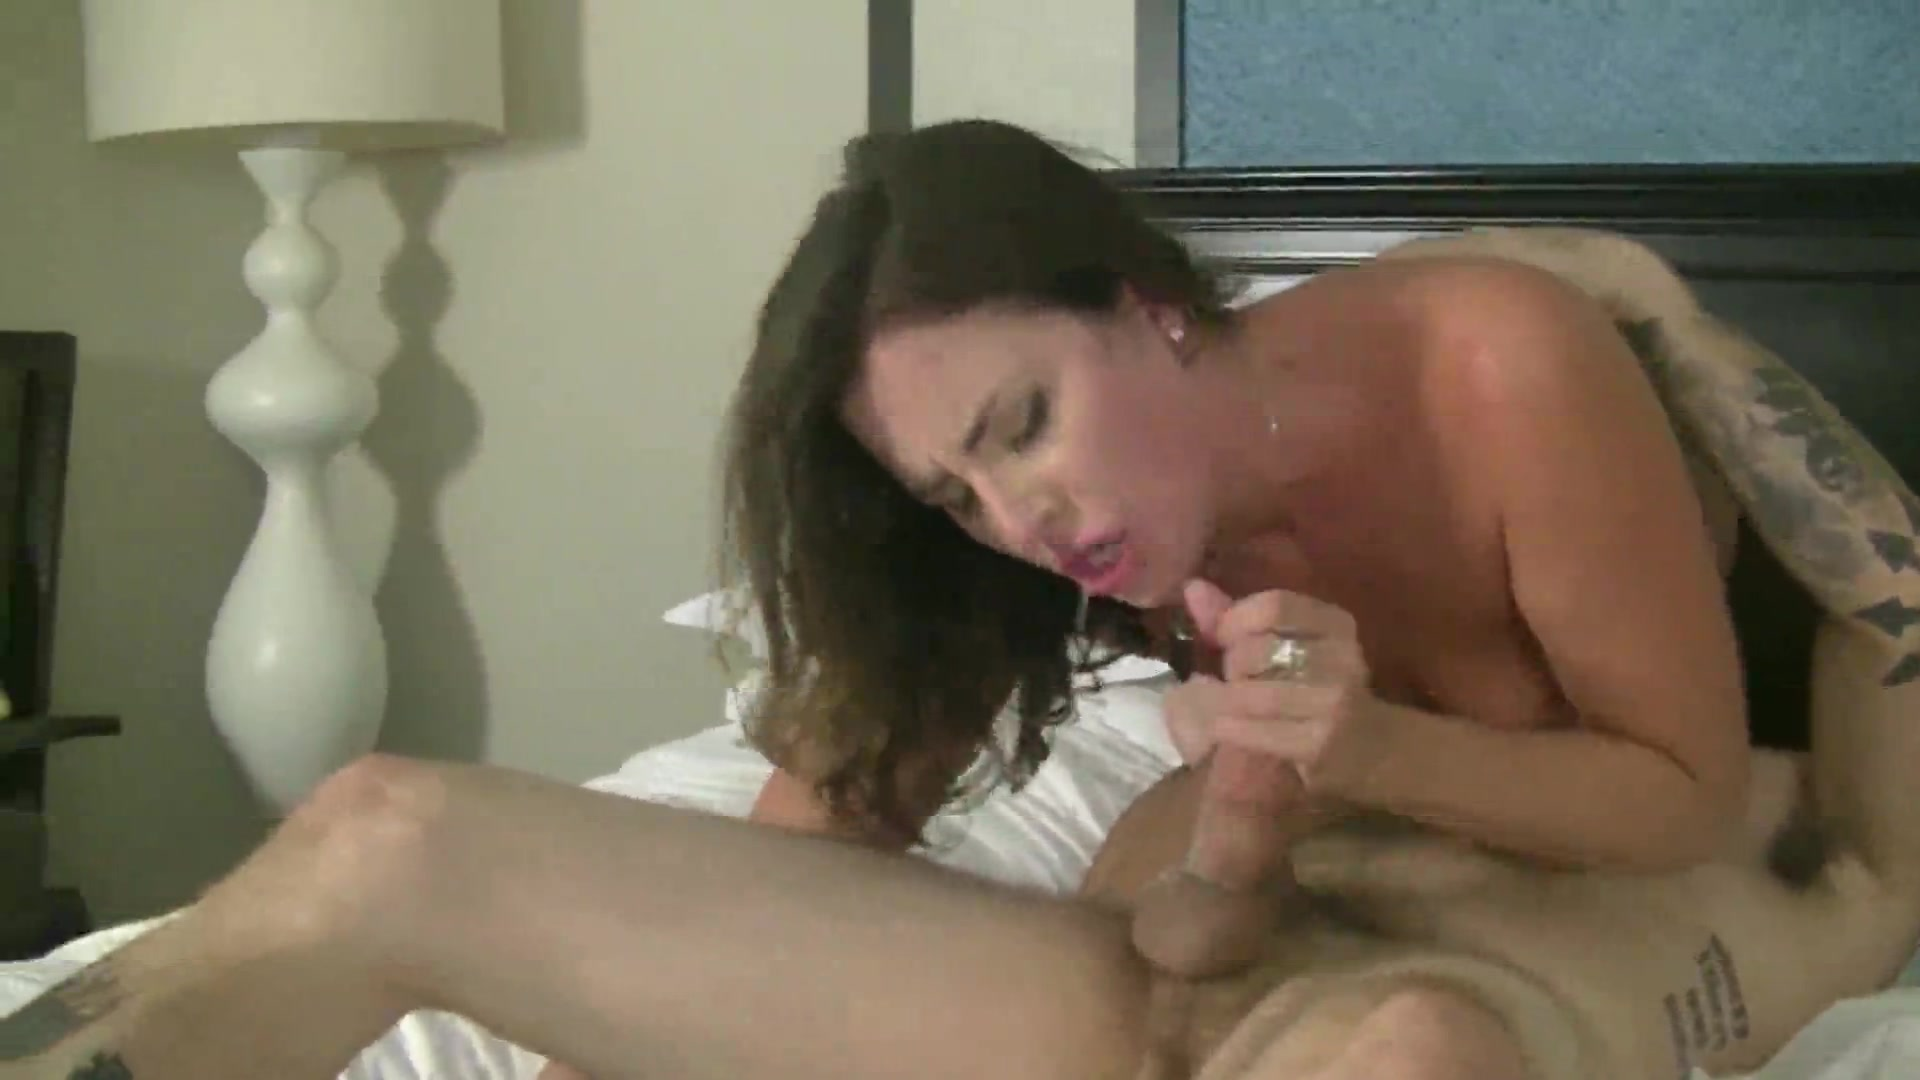 Affair Porn helenas cock quest – cheating wife 3 full vid my affair